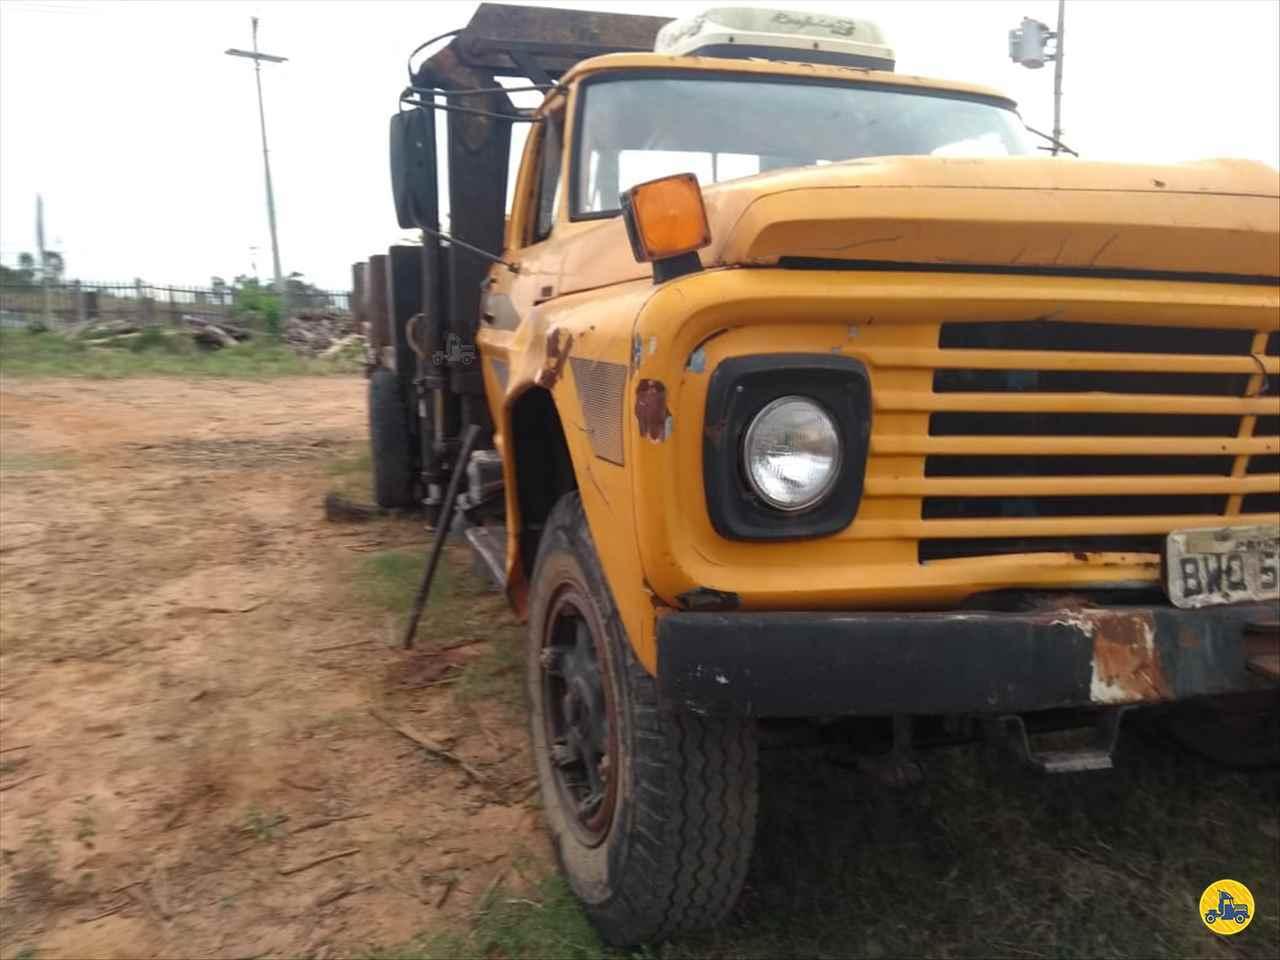 F22000 de Barbosa Caminhões - LINS/SP